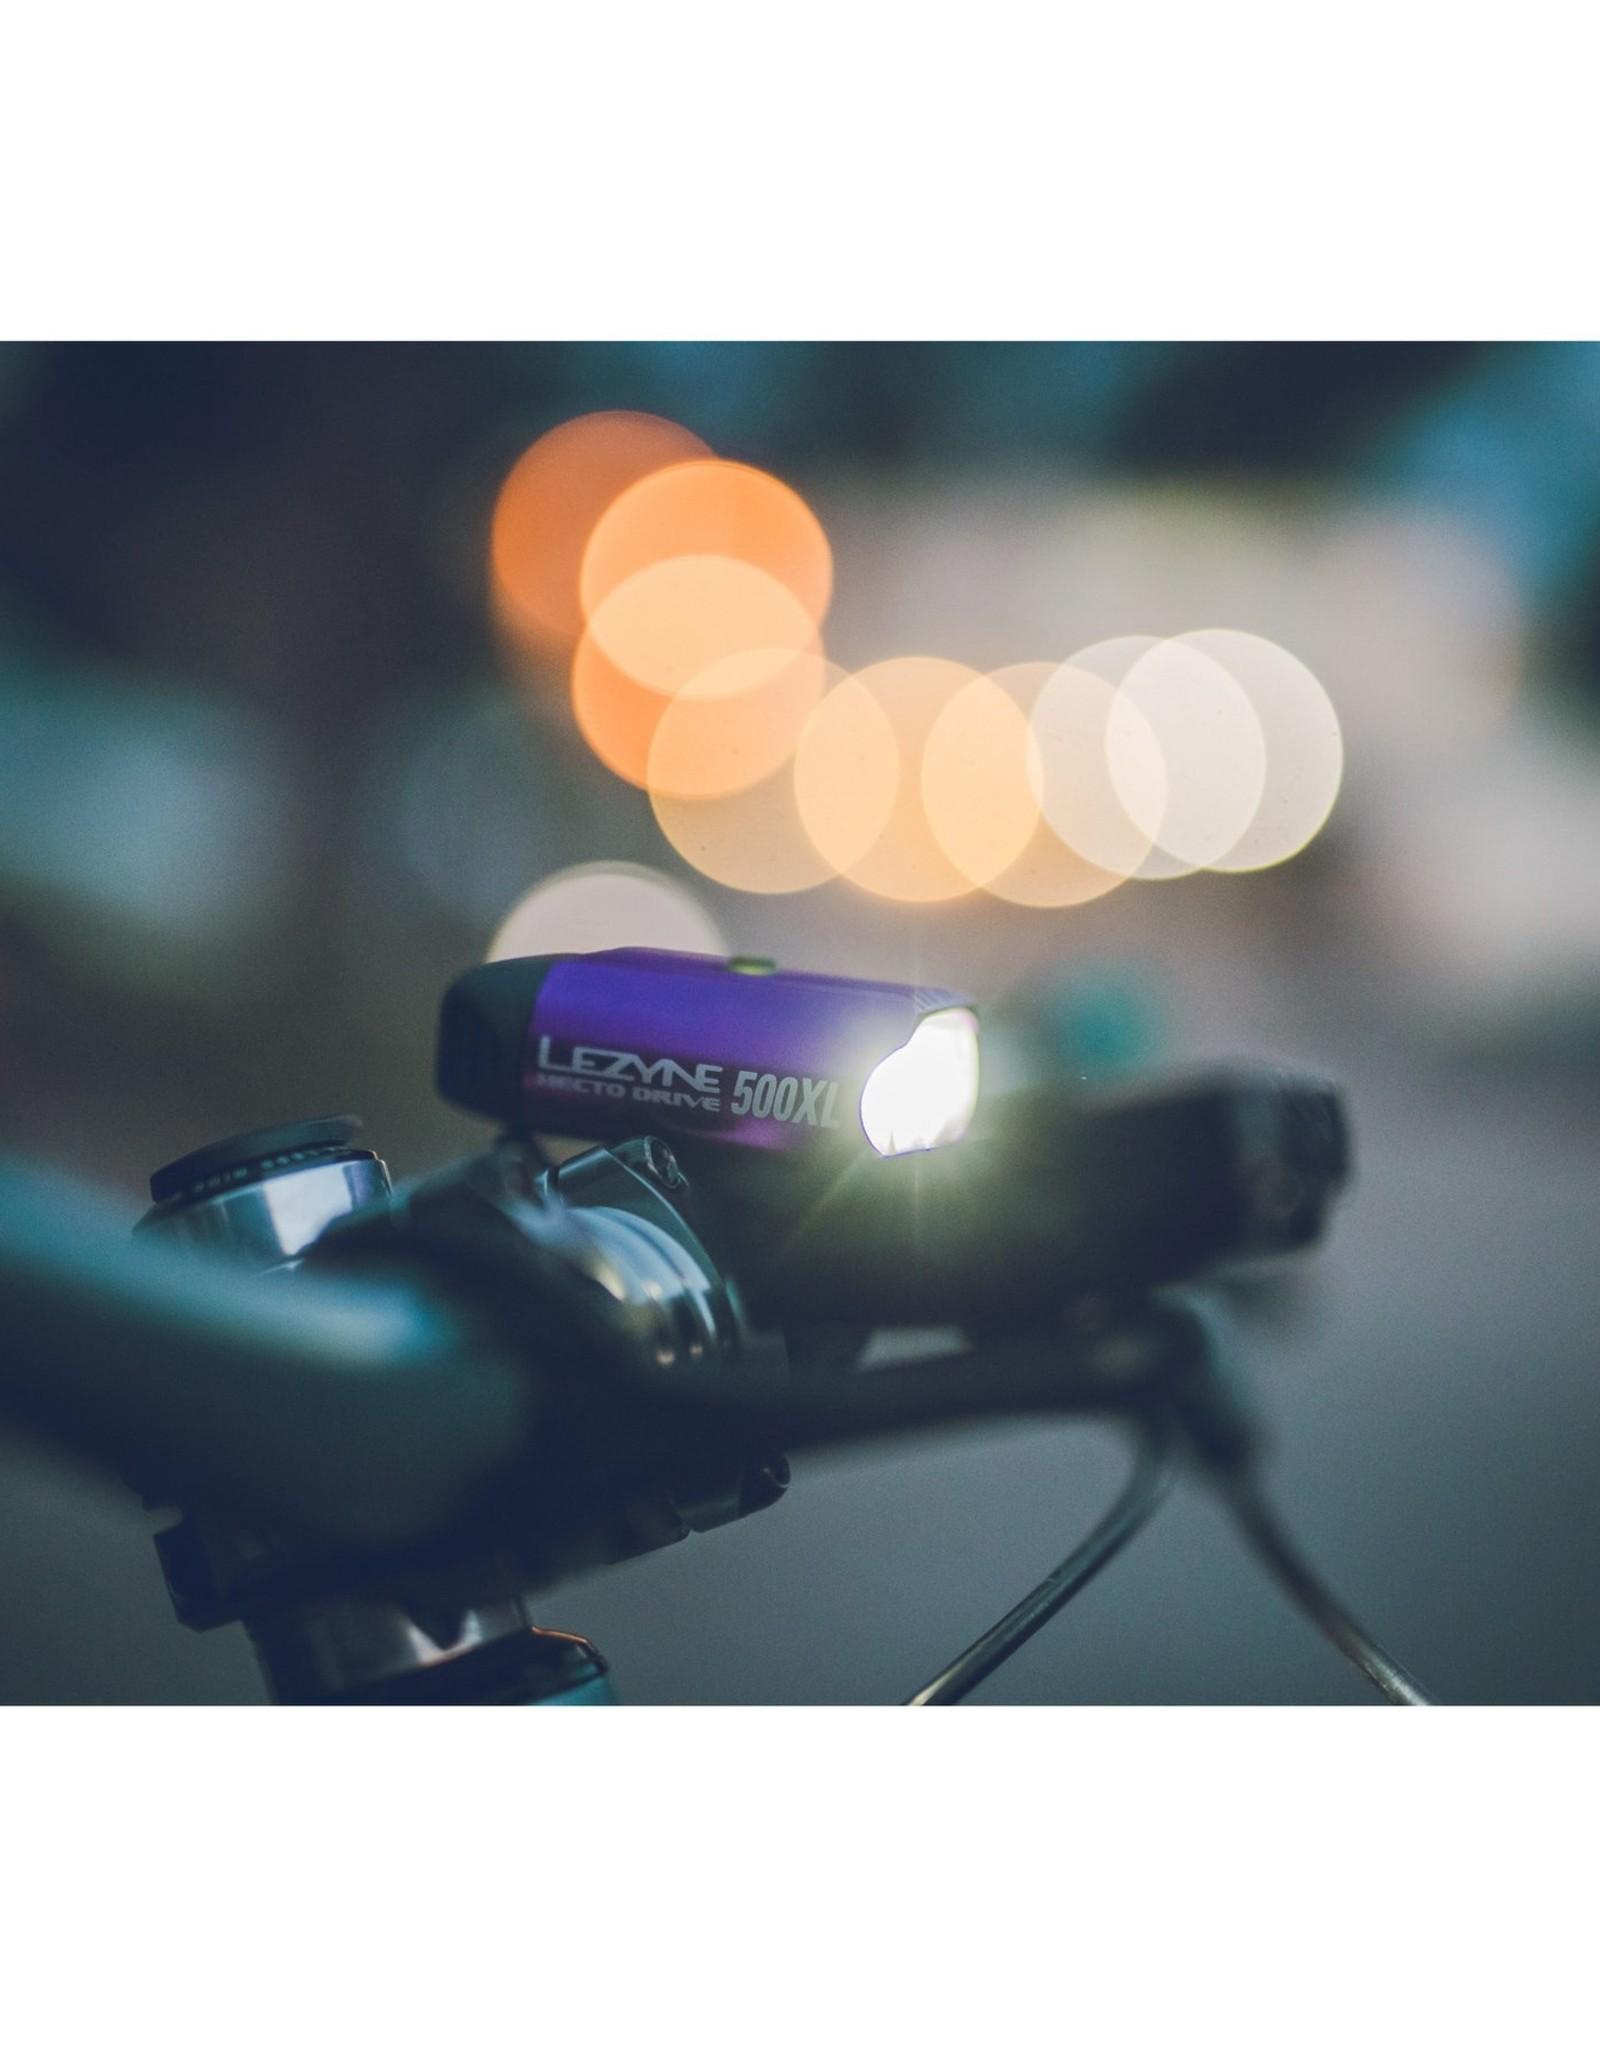 Lezyne Lezyne Hecto Drive 500XL Headlight: Gloss Black